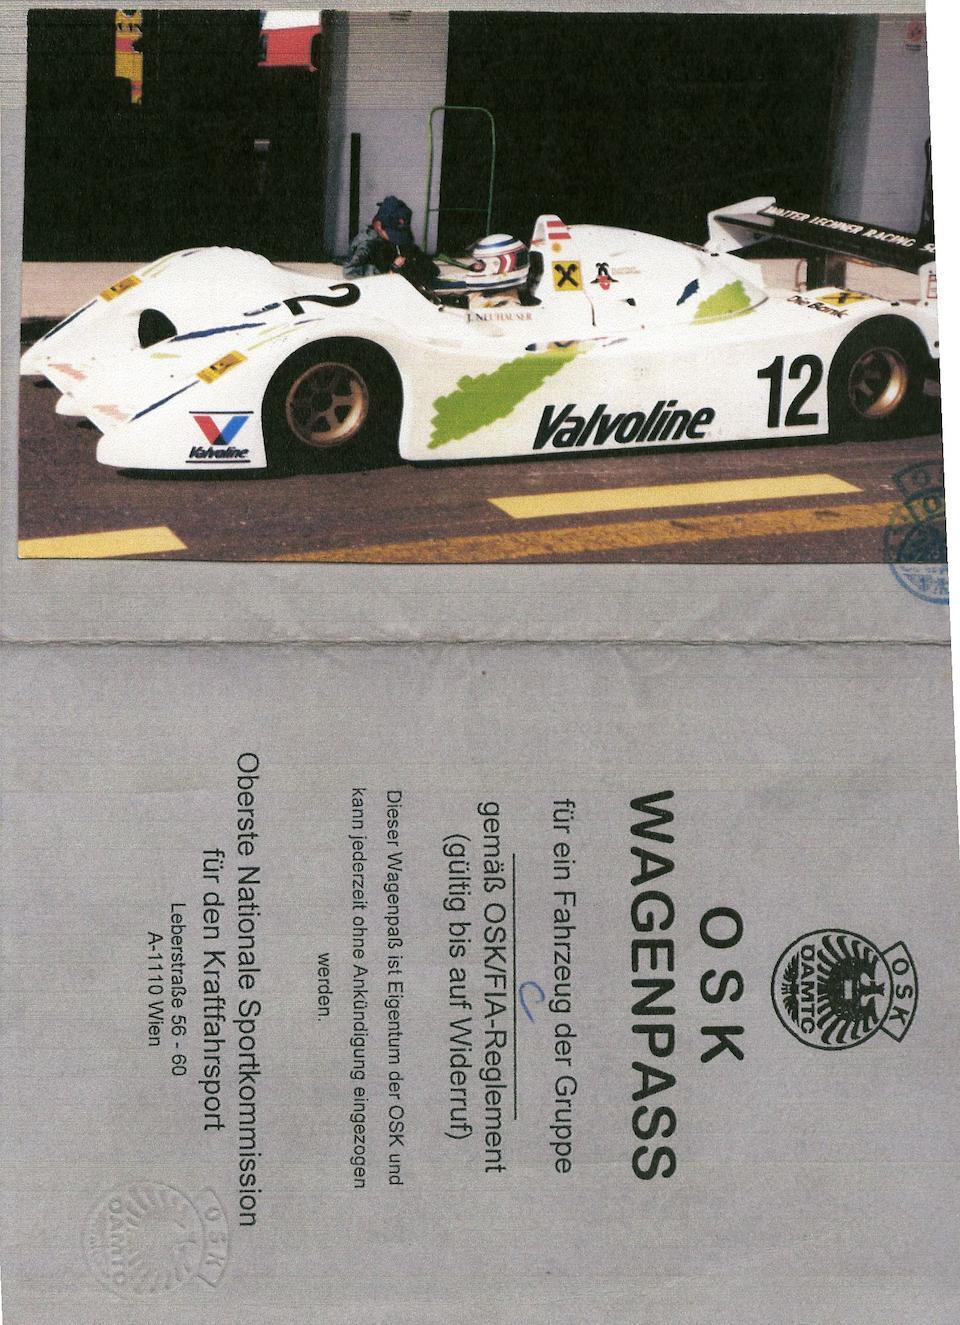 Ex-Walter Lechner, Josef Neuhauser; Inteserie Division I Championship-winning,1991 Lechner Spyder  LSC1 Sports Prototype  Chassis no. LSC 1